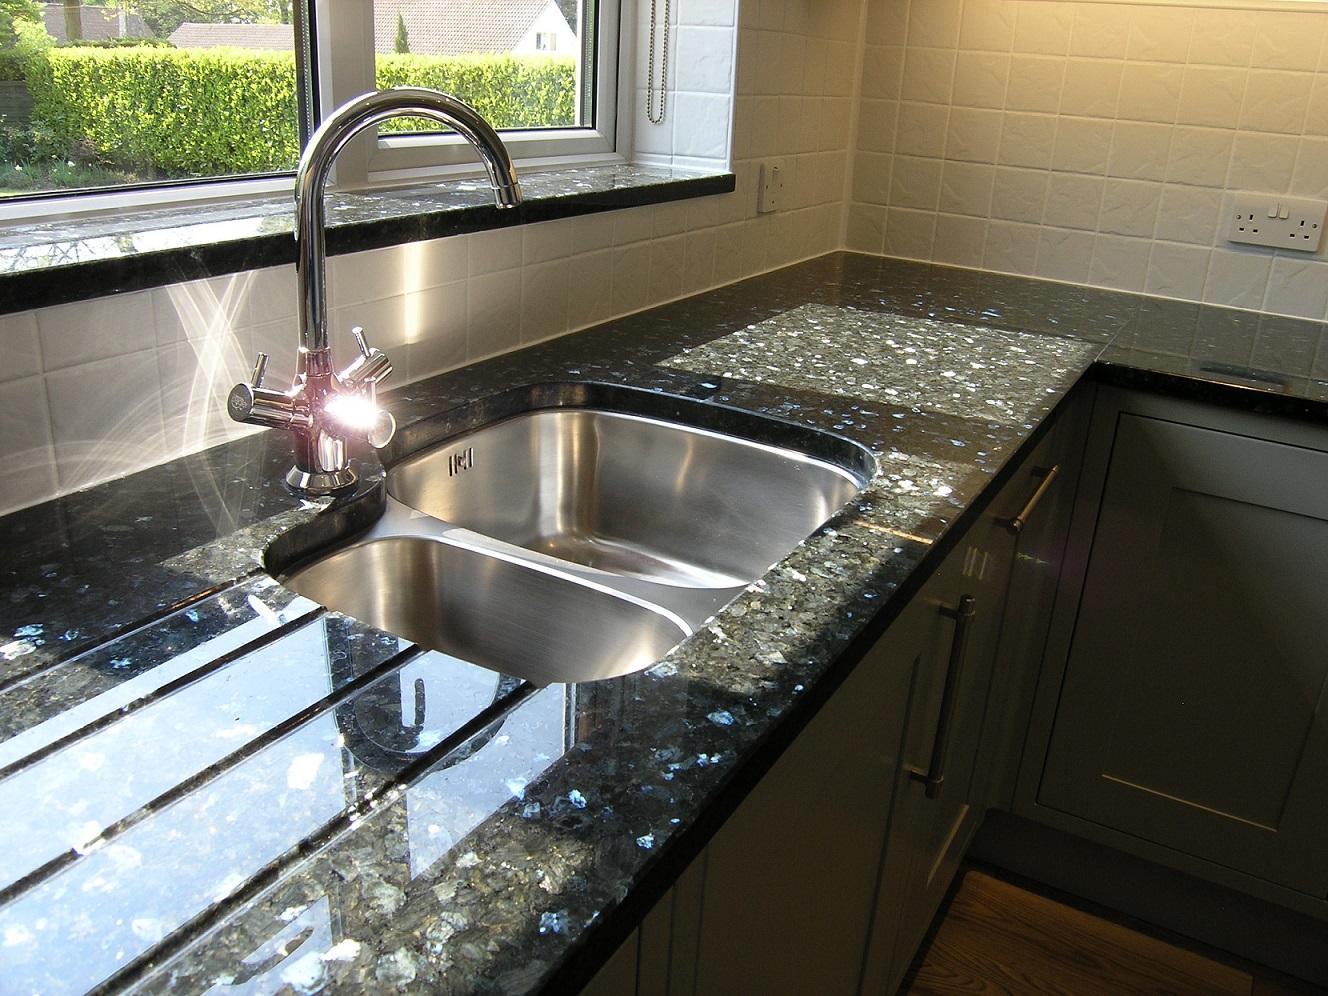 Whitton Worktops Bespoke Kitchen Worktops At Affordable Prices